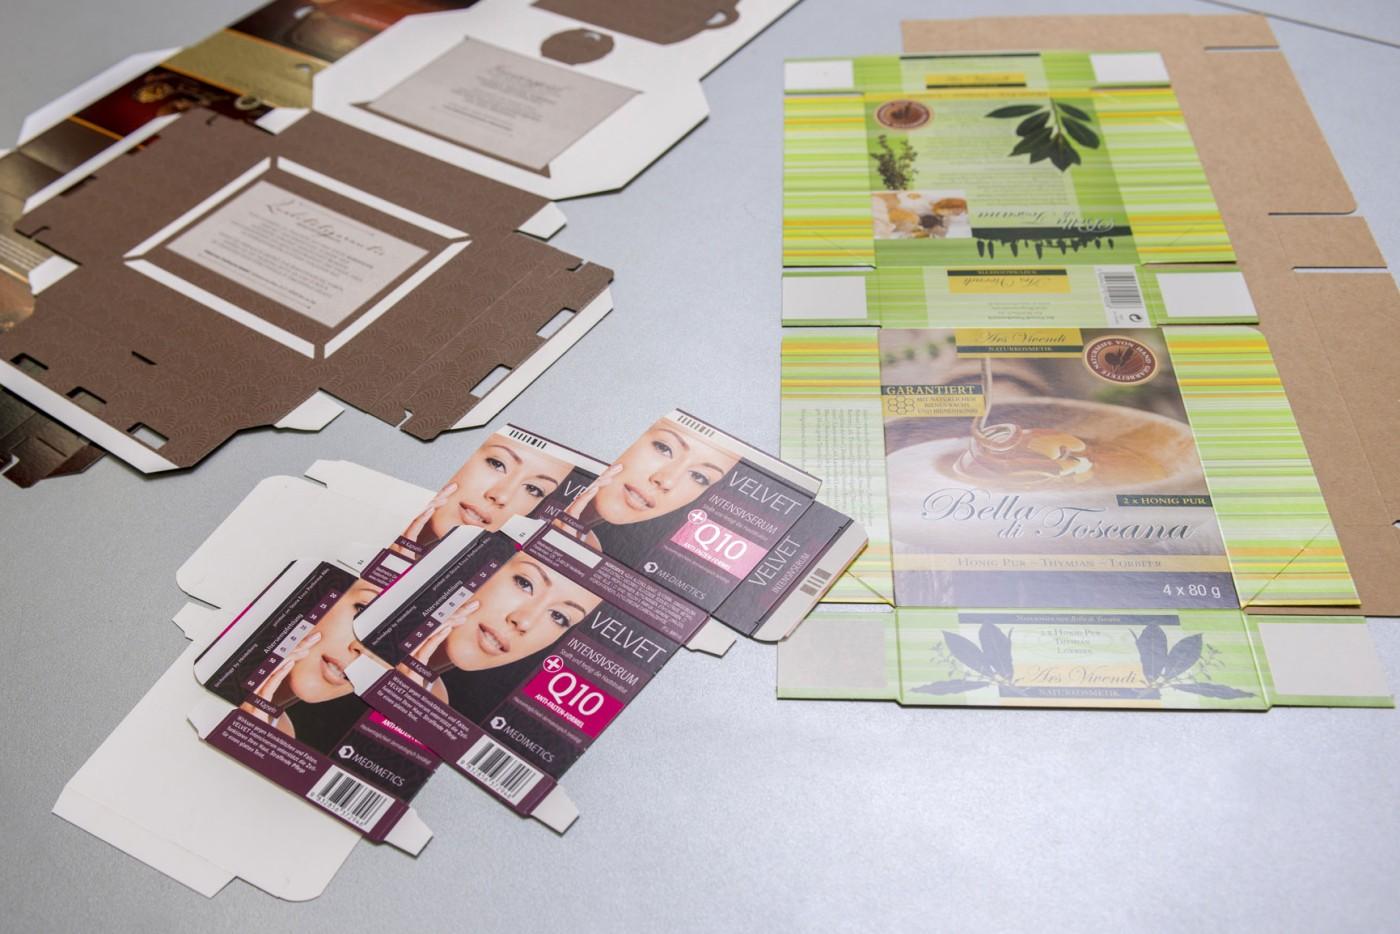 hdm2014121_packagingdays_lfd4774